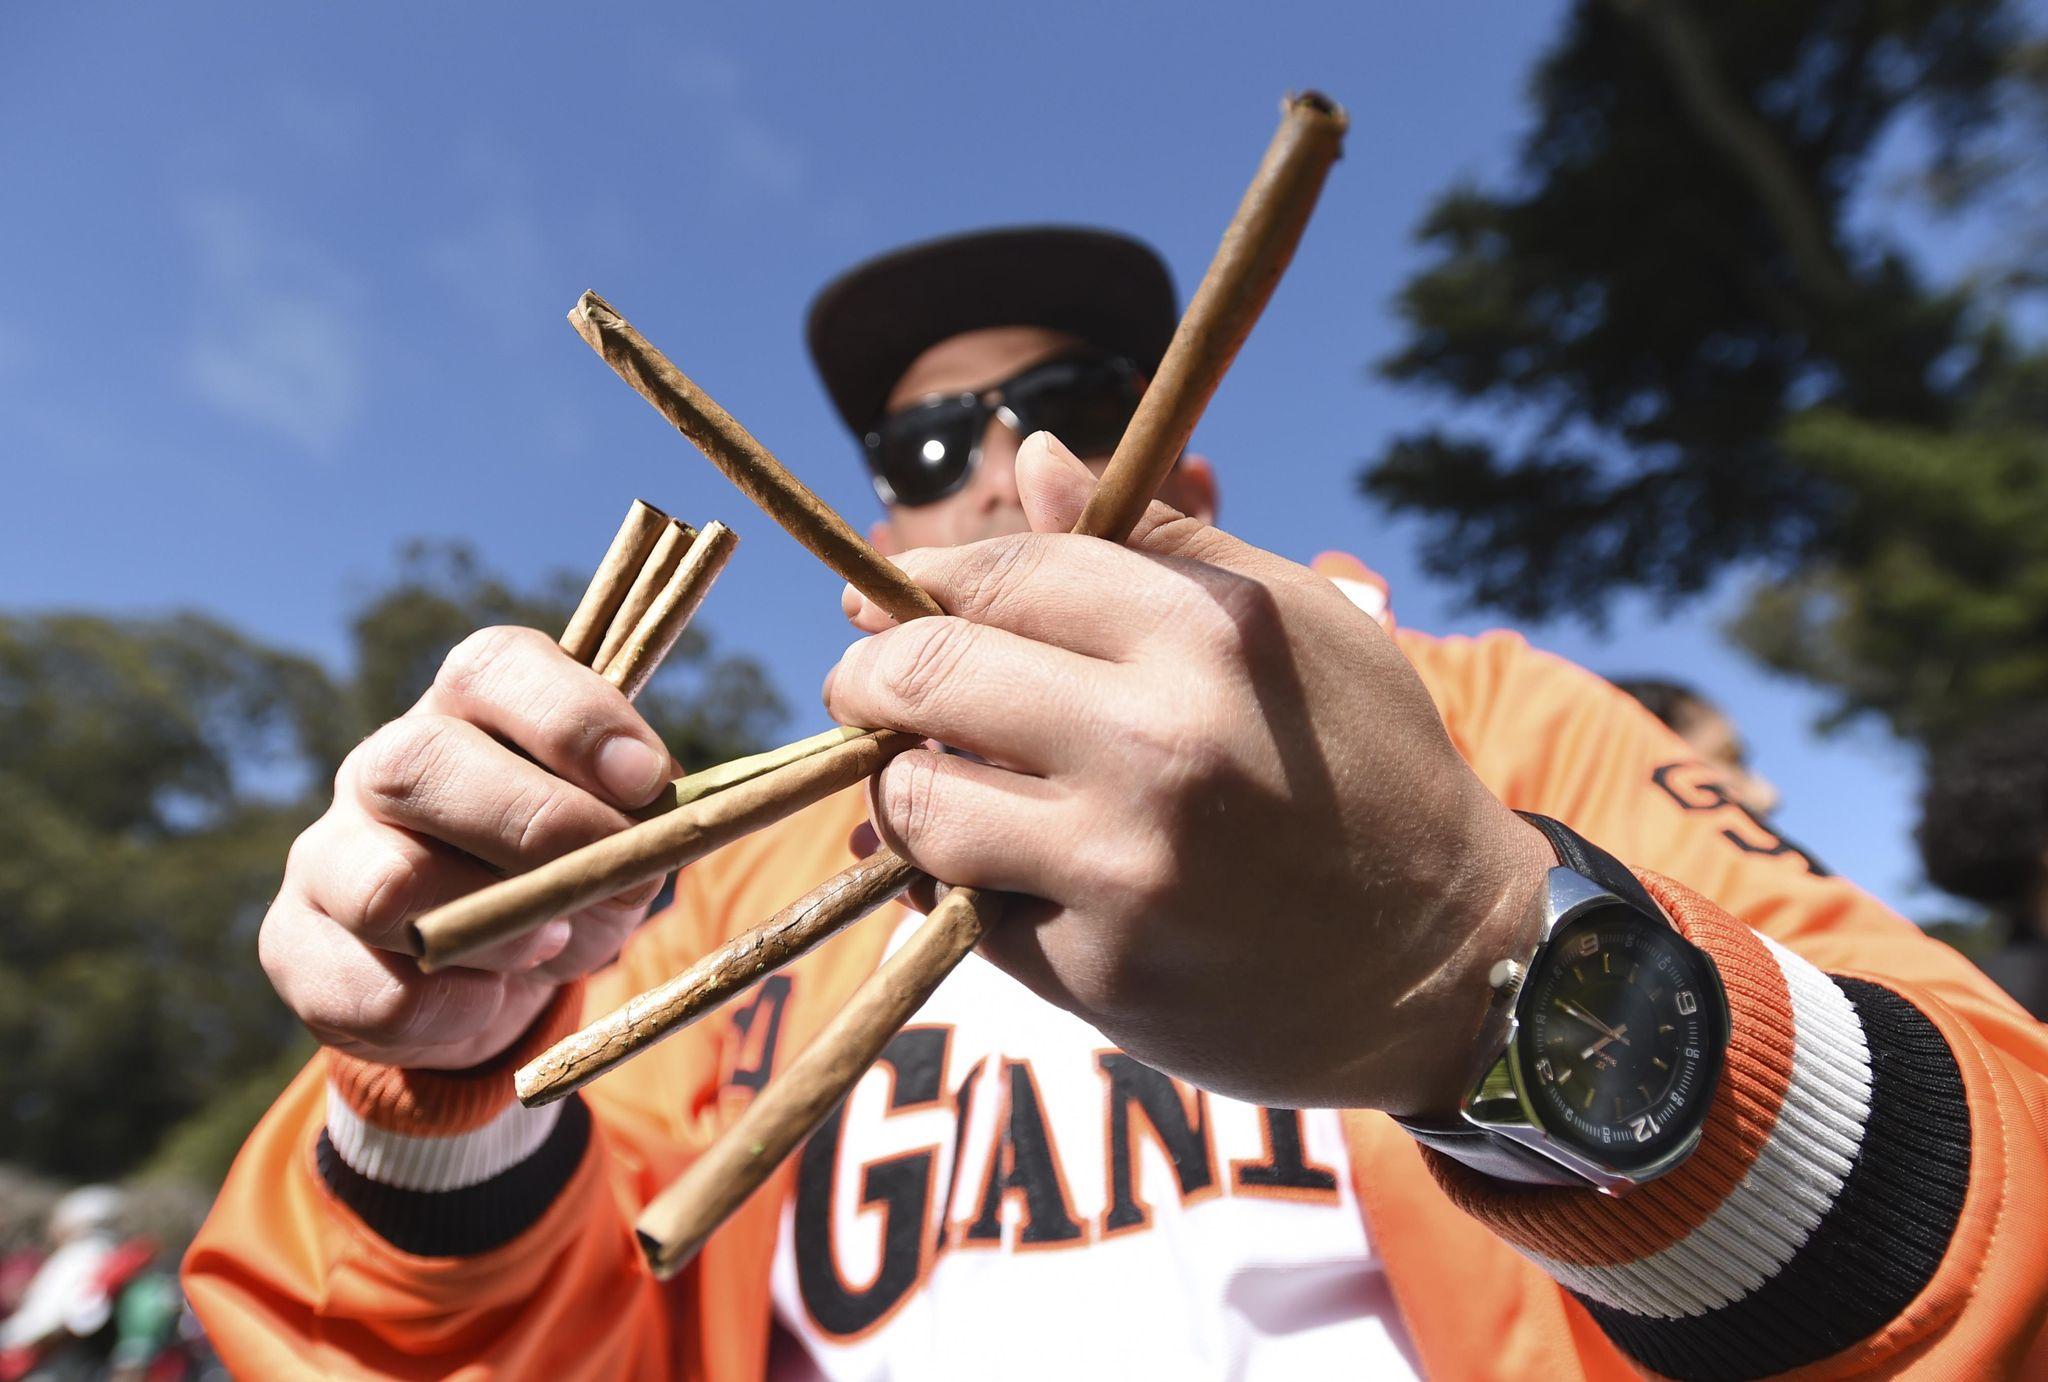 Marijuana convictions expected to be expunged under bill passed in California legislature